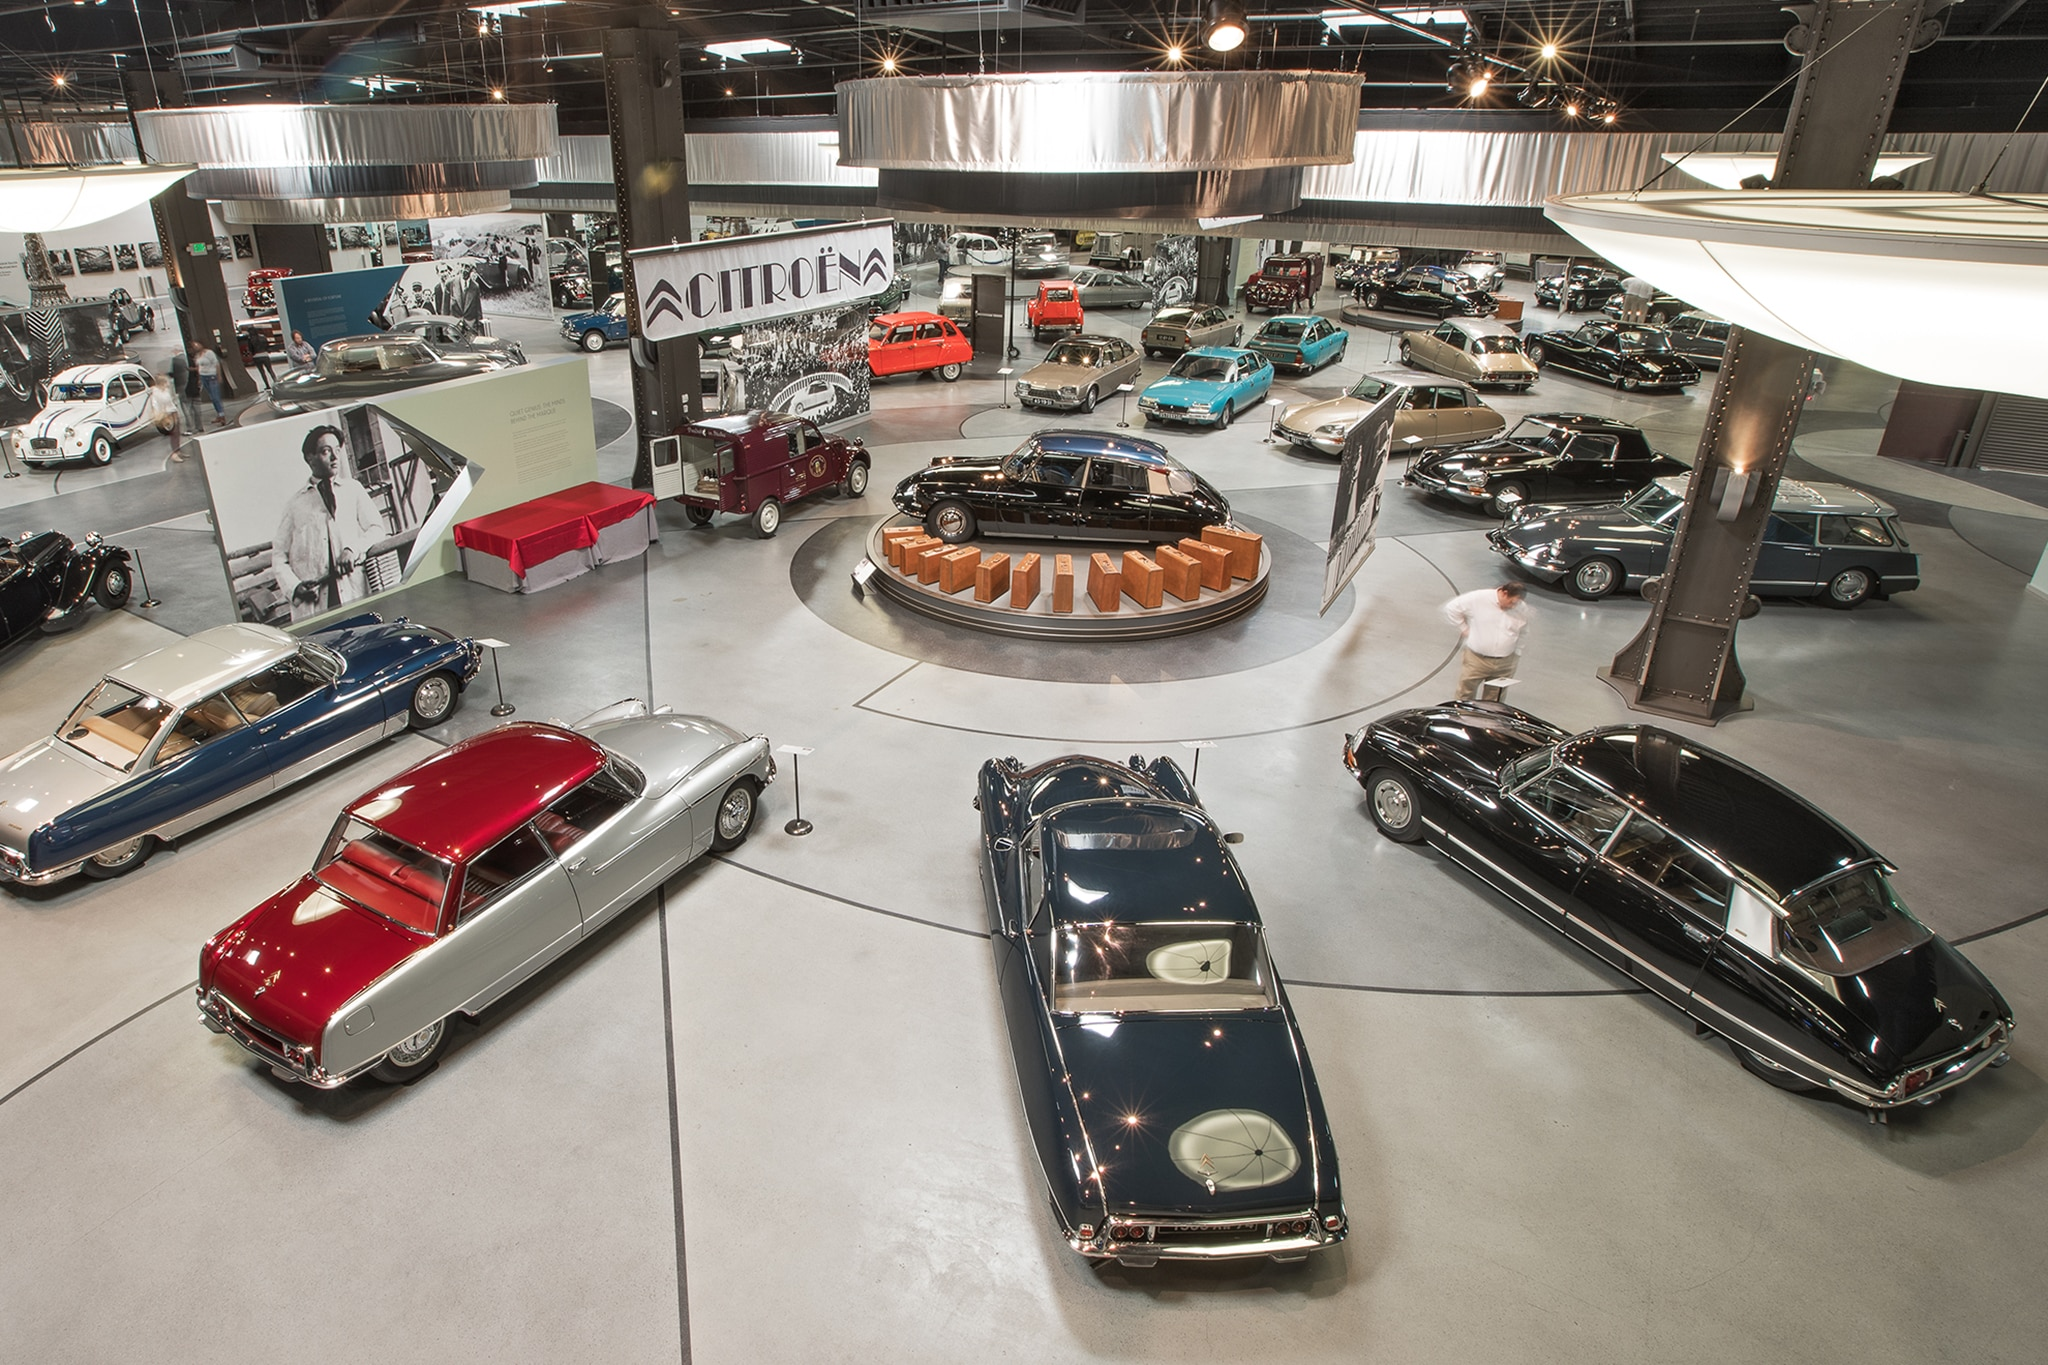 Citroen Exhibit At The Mullin Automotive Museum 41